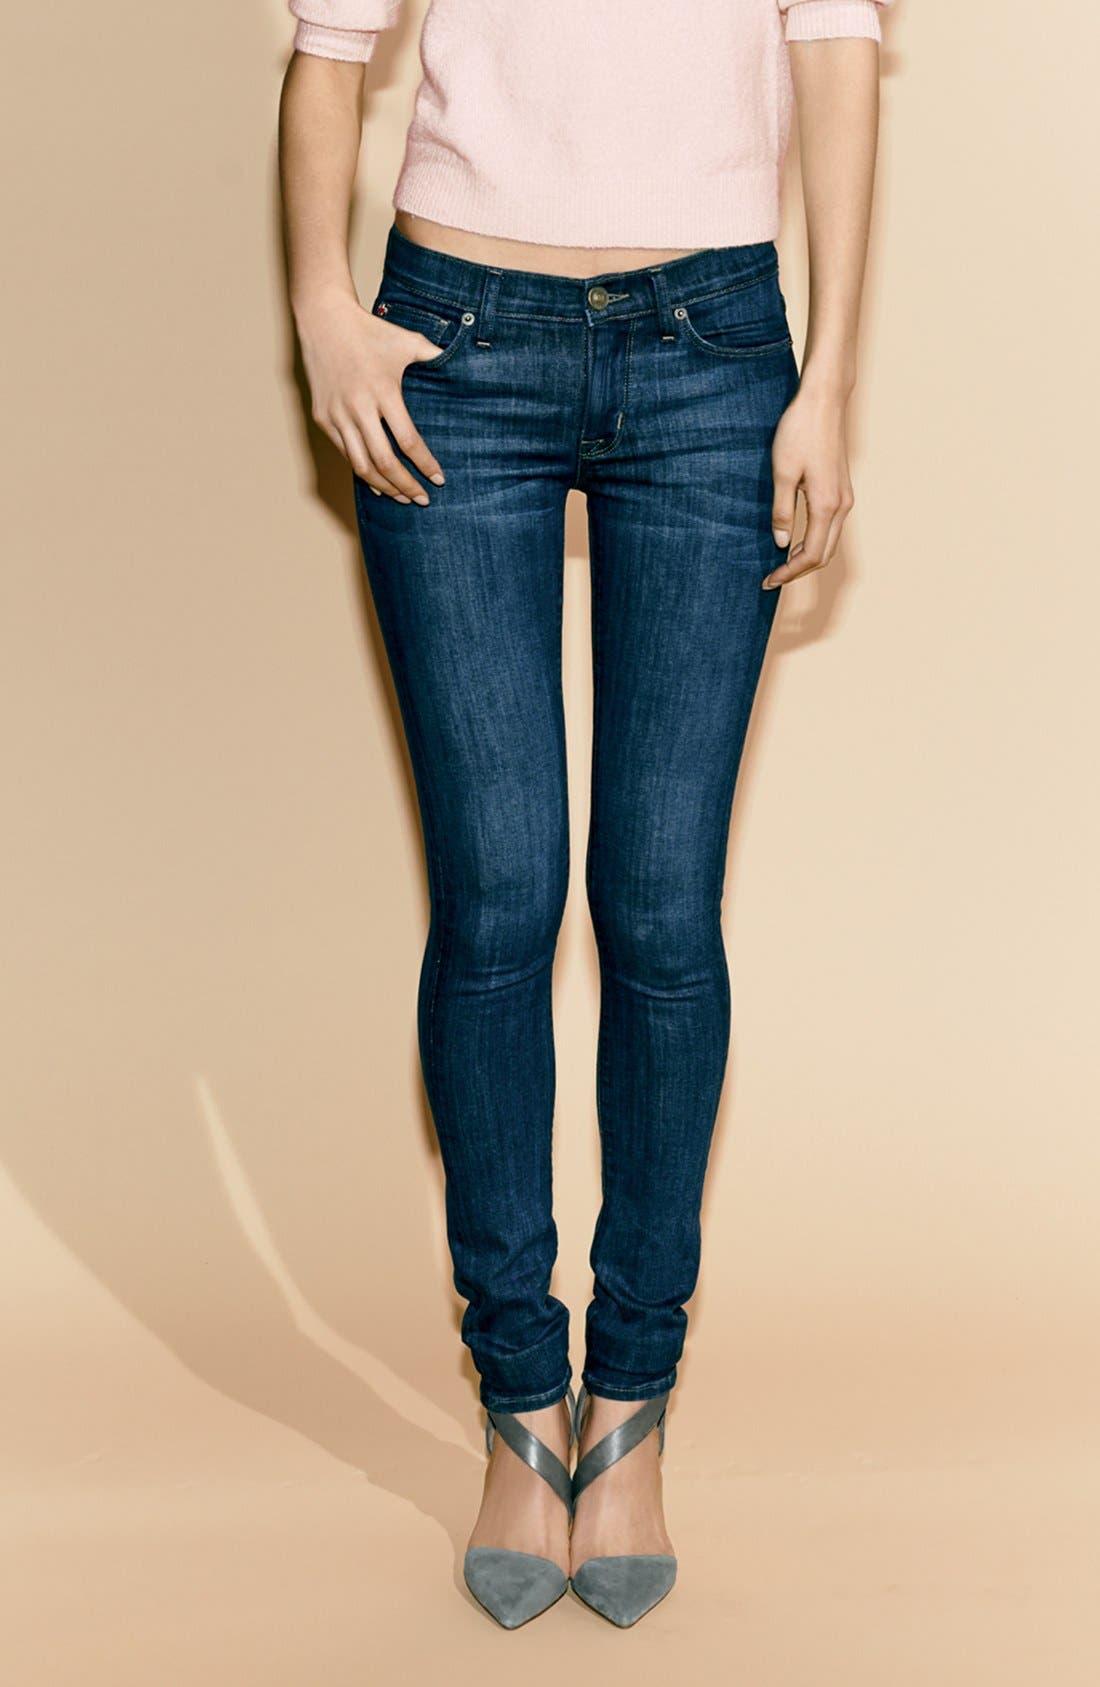 HUDSON JEANS, 'Collette' Skinny Jeans, Alternate thumbnail 7, color, 400